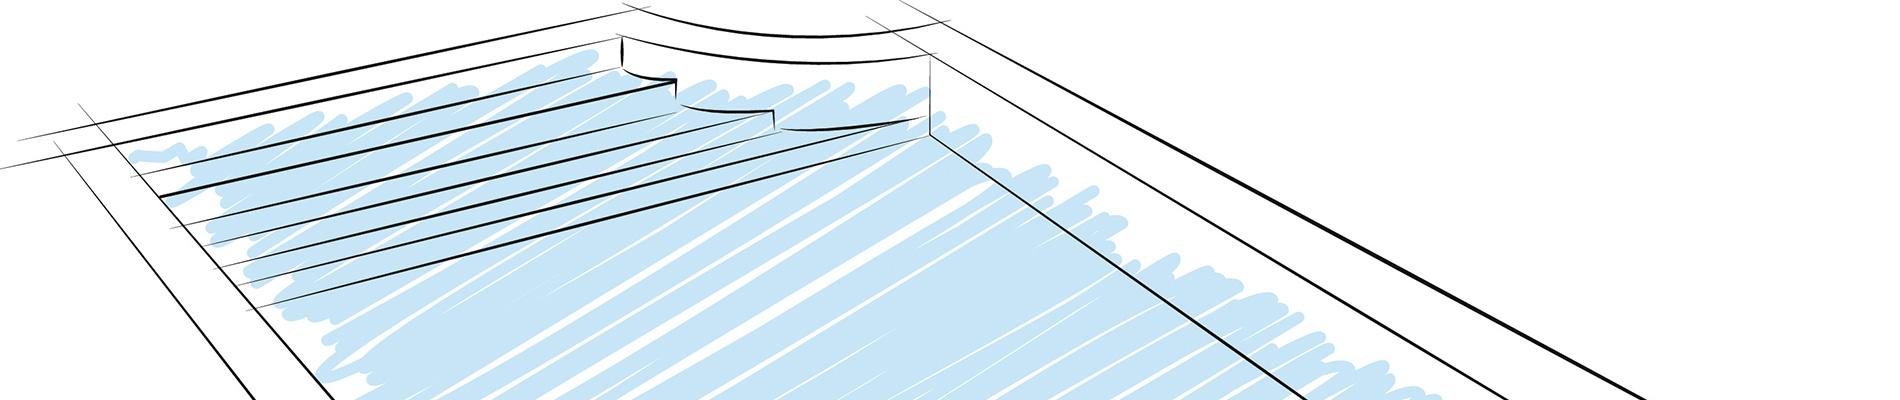 MANOIR, the swimming pool design